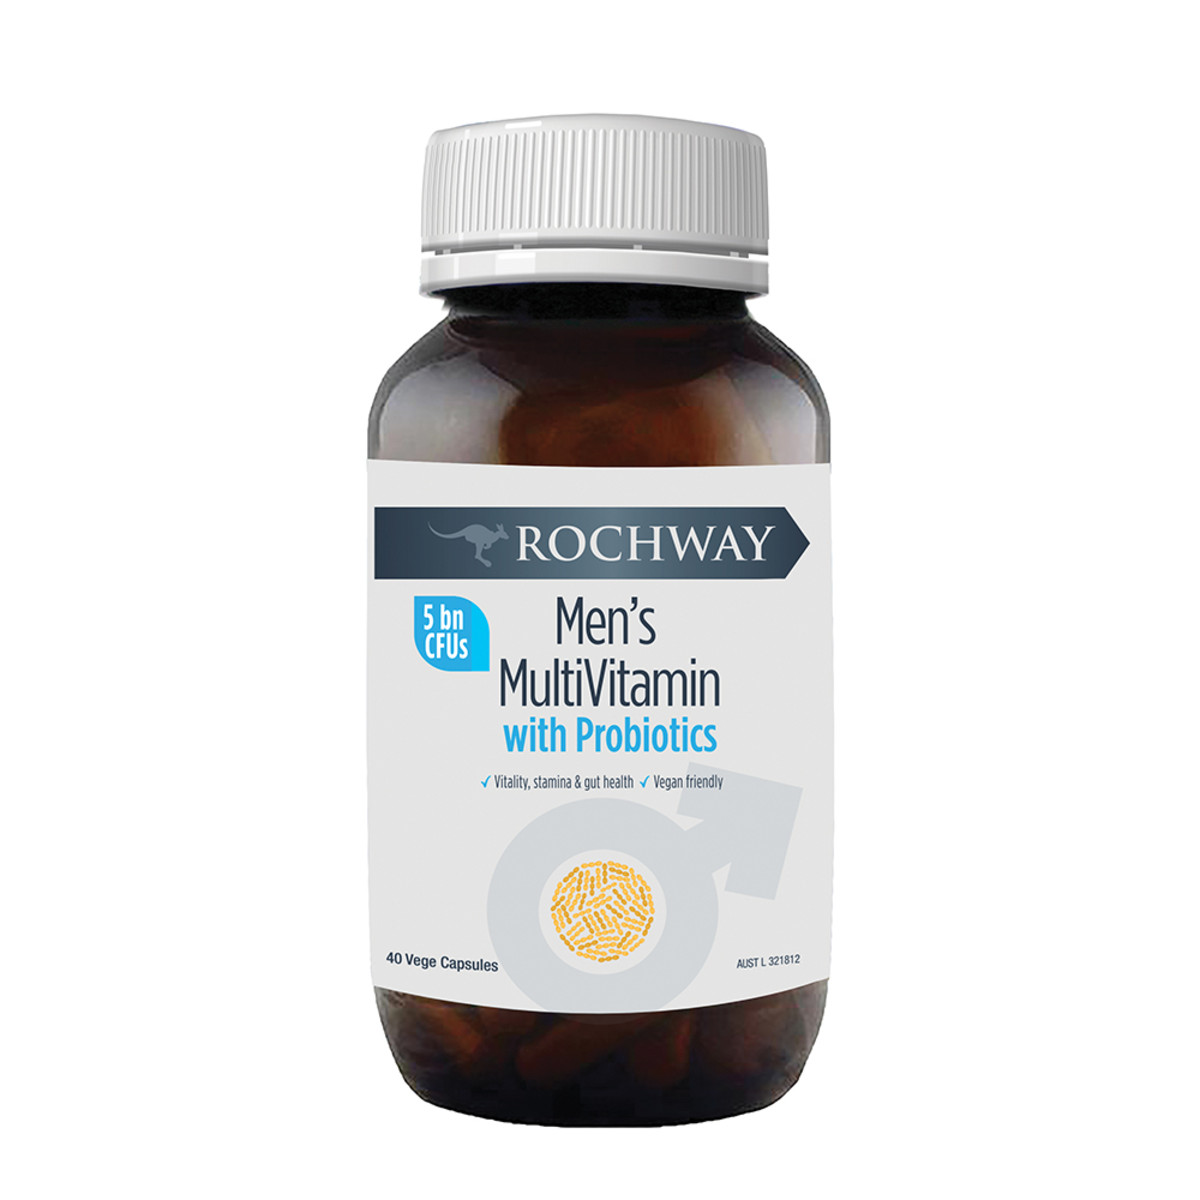 Rochway Men's MutiVitamin with Probiotics 40vc_Media-01